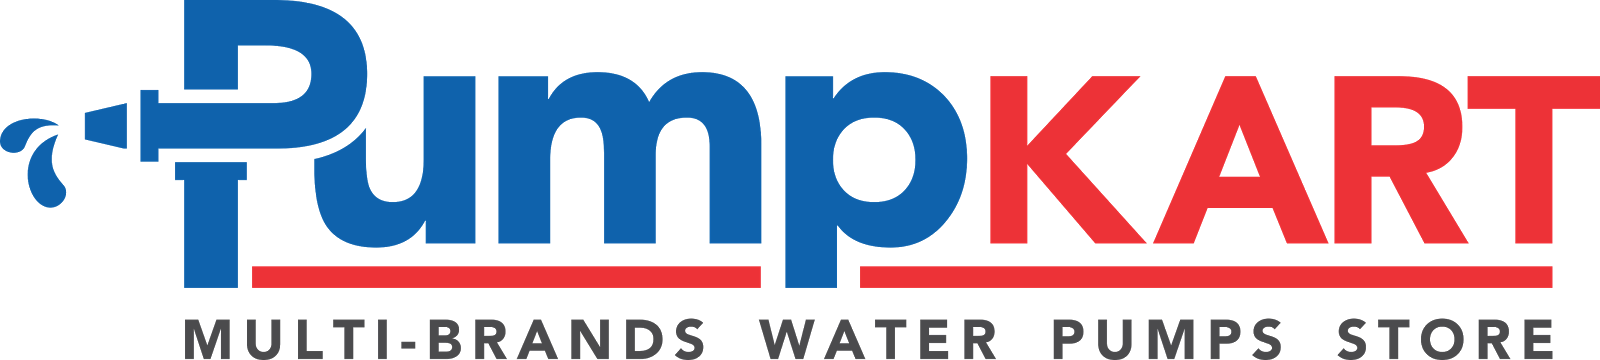 Water Pump Dealers | Water Pumps India - Pumpkart